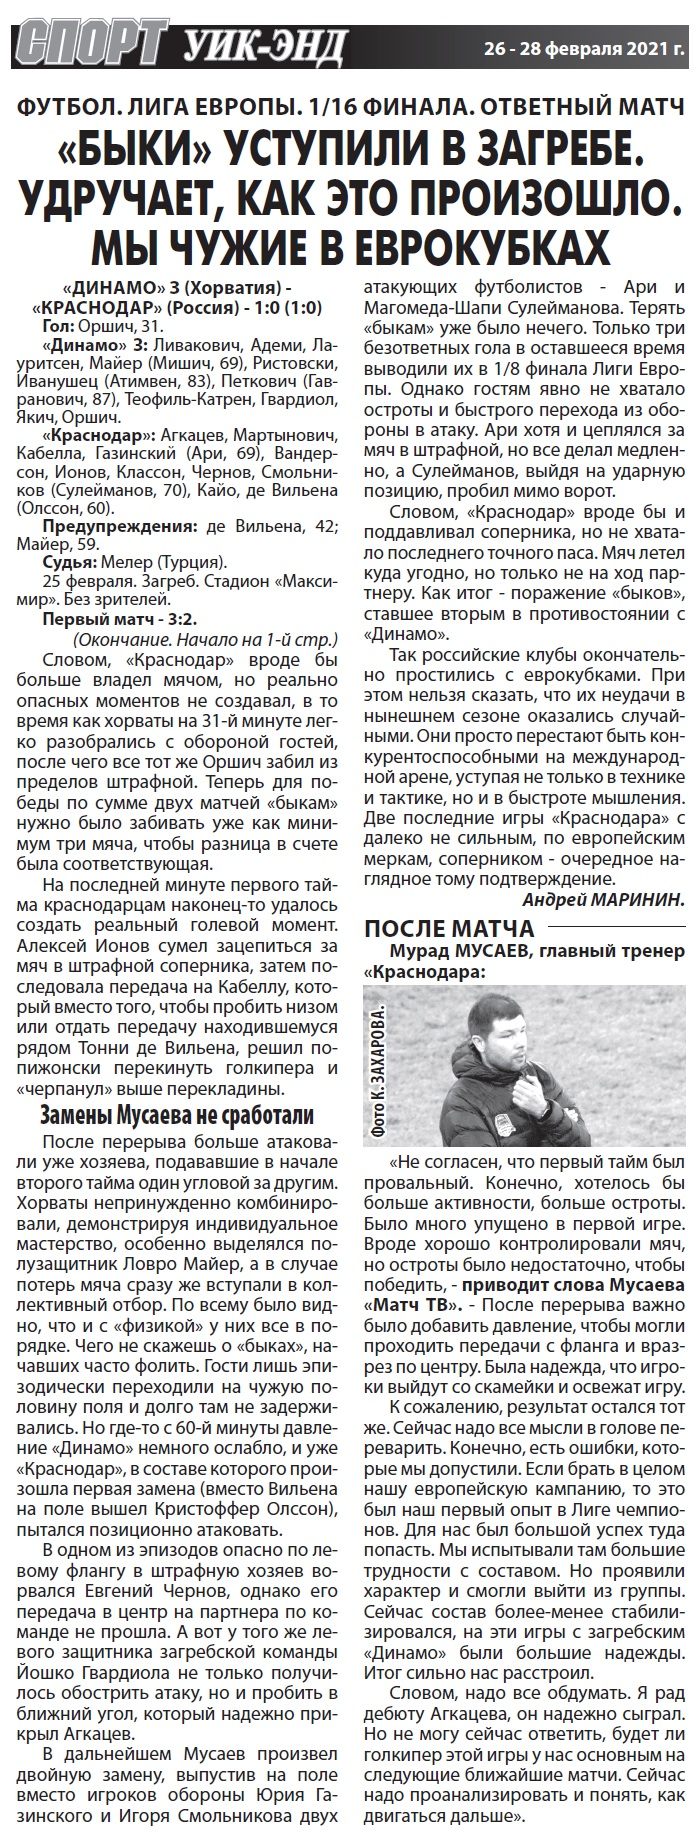 Динамо Загреб (Хорватия) - Краснодар (Россия) 1:0